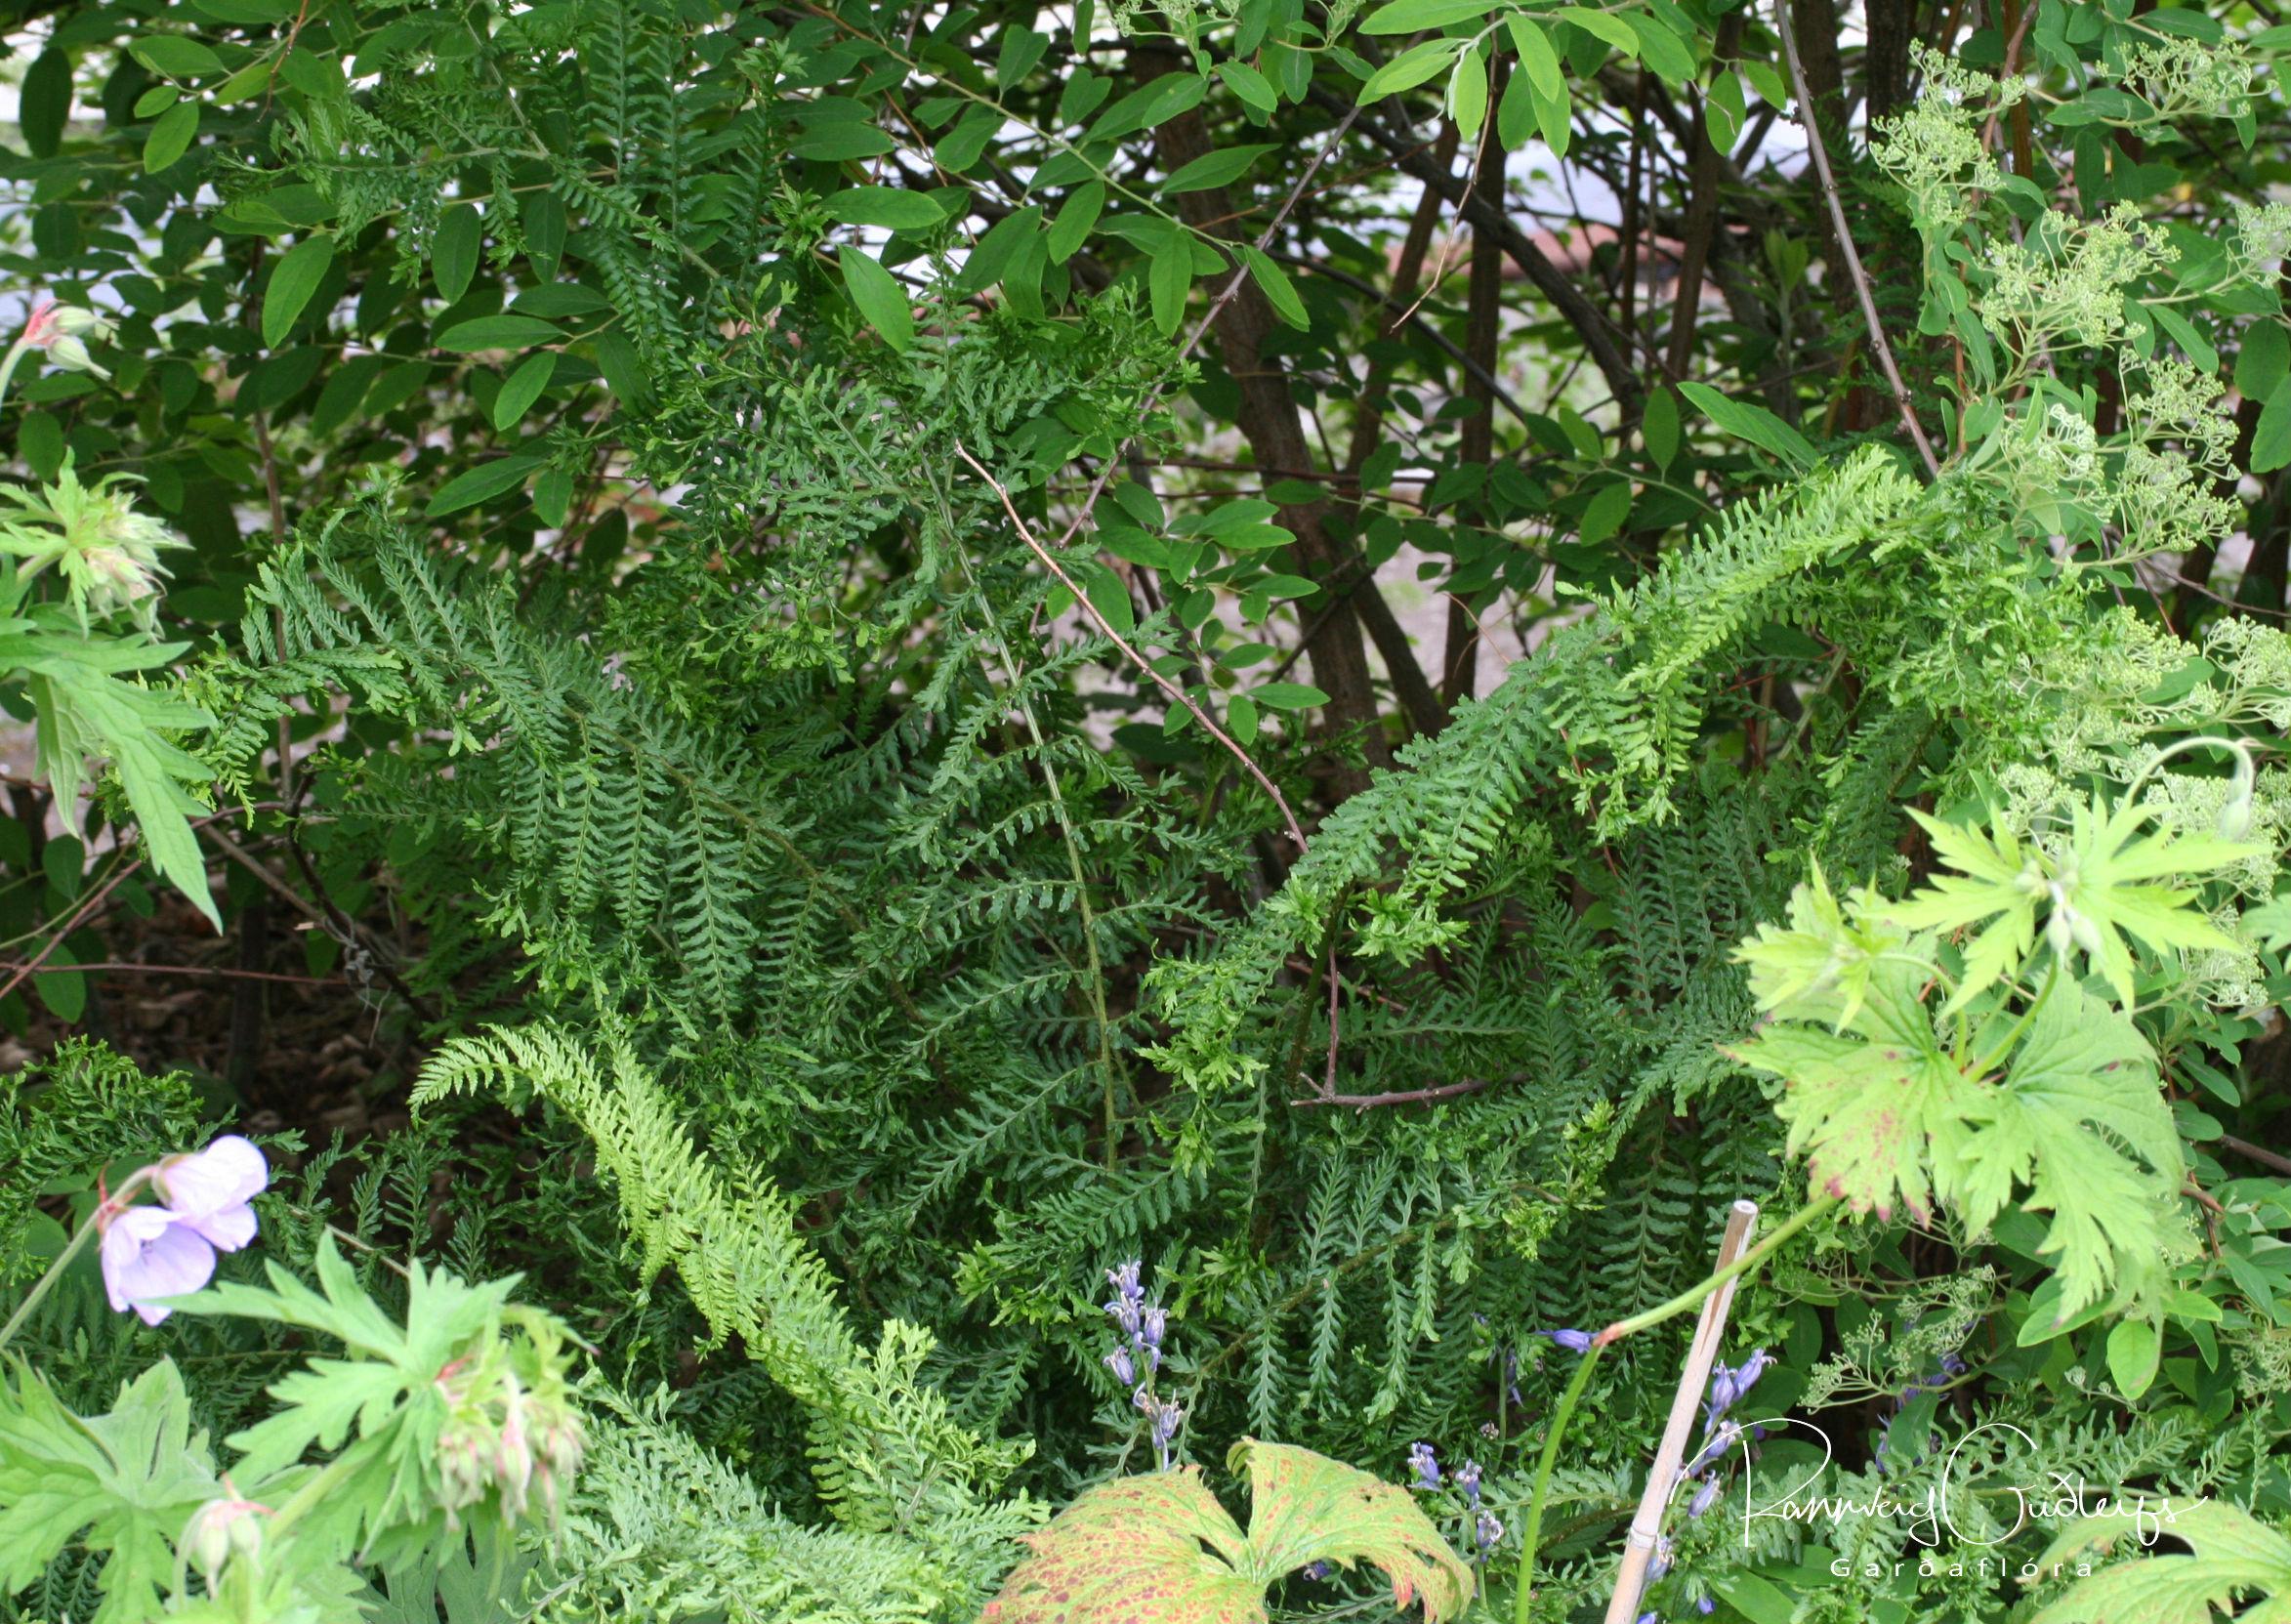 Dryopteris filix-mas 'Cristata'